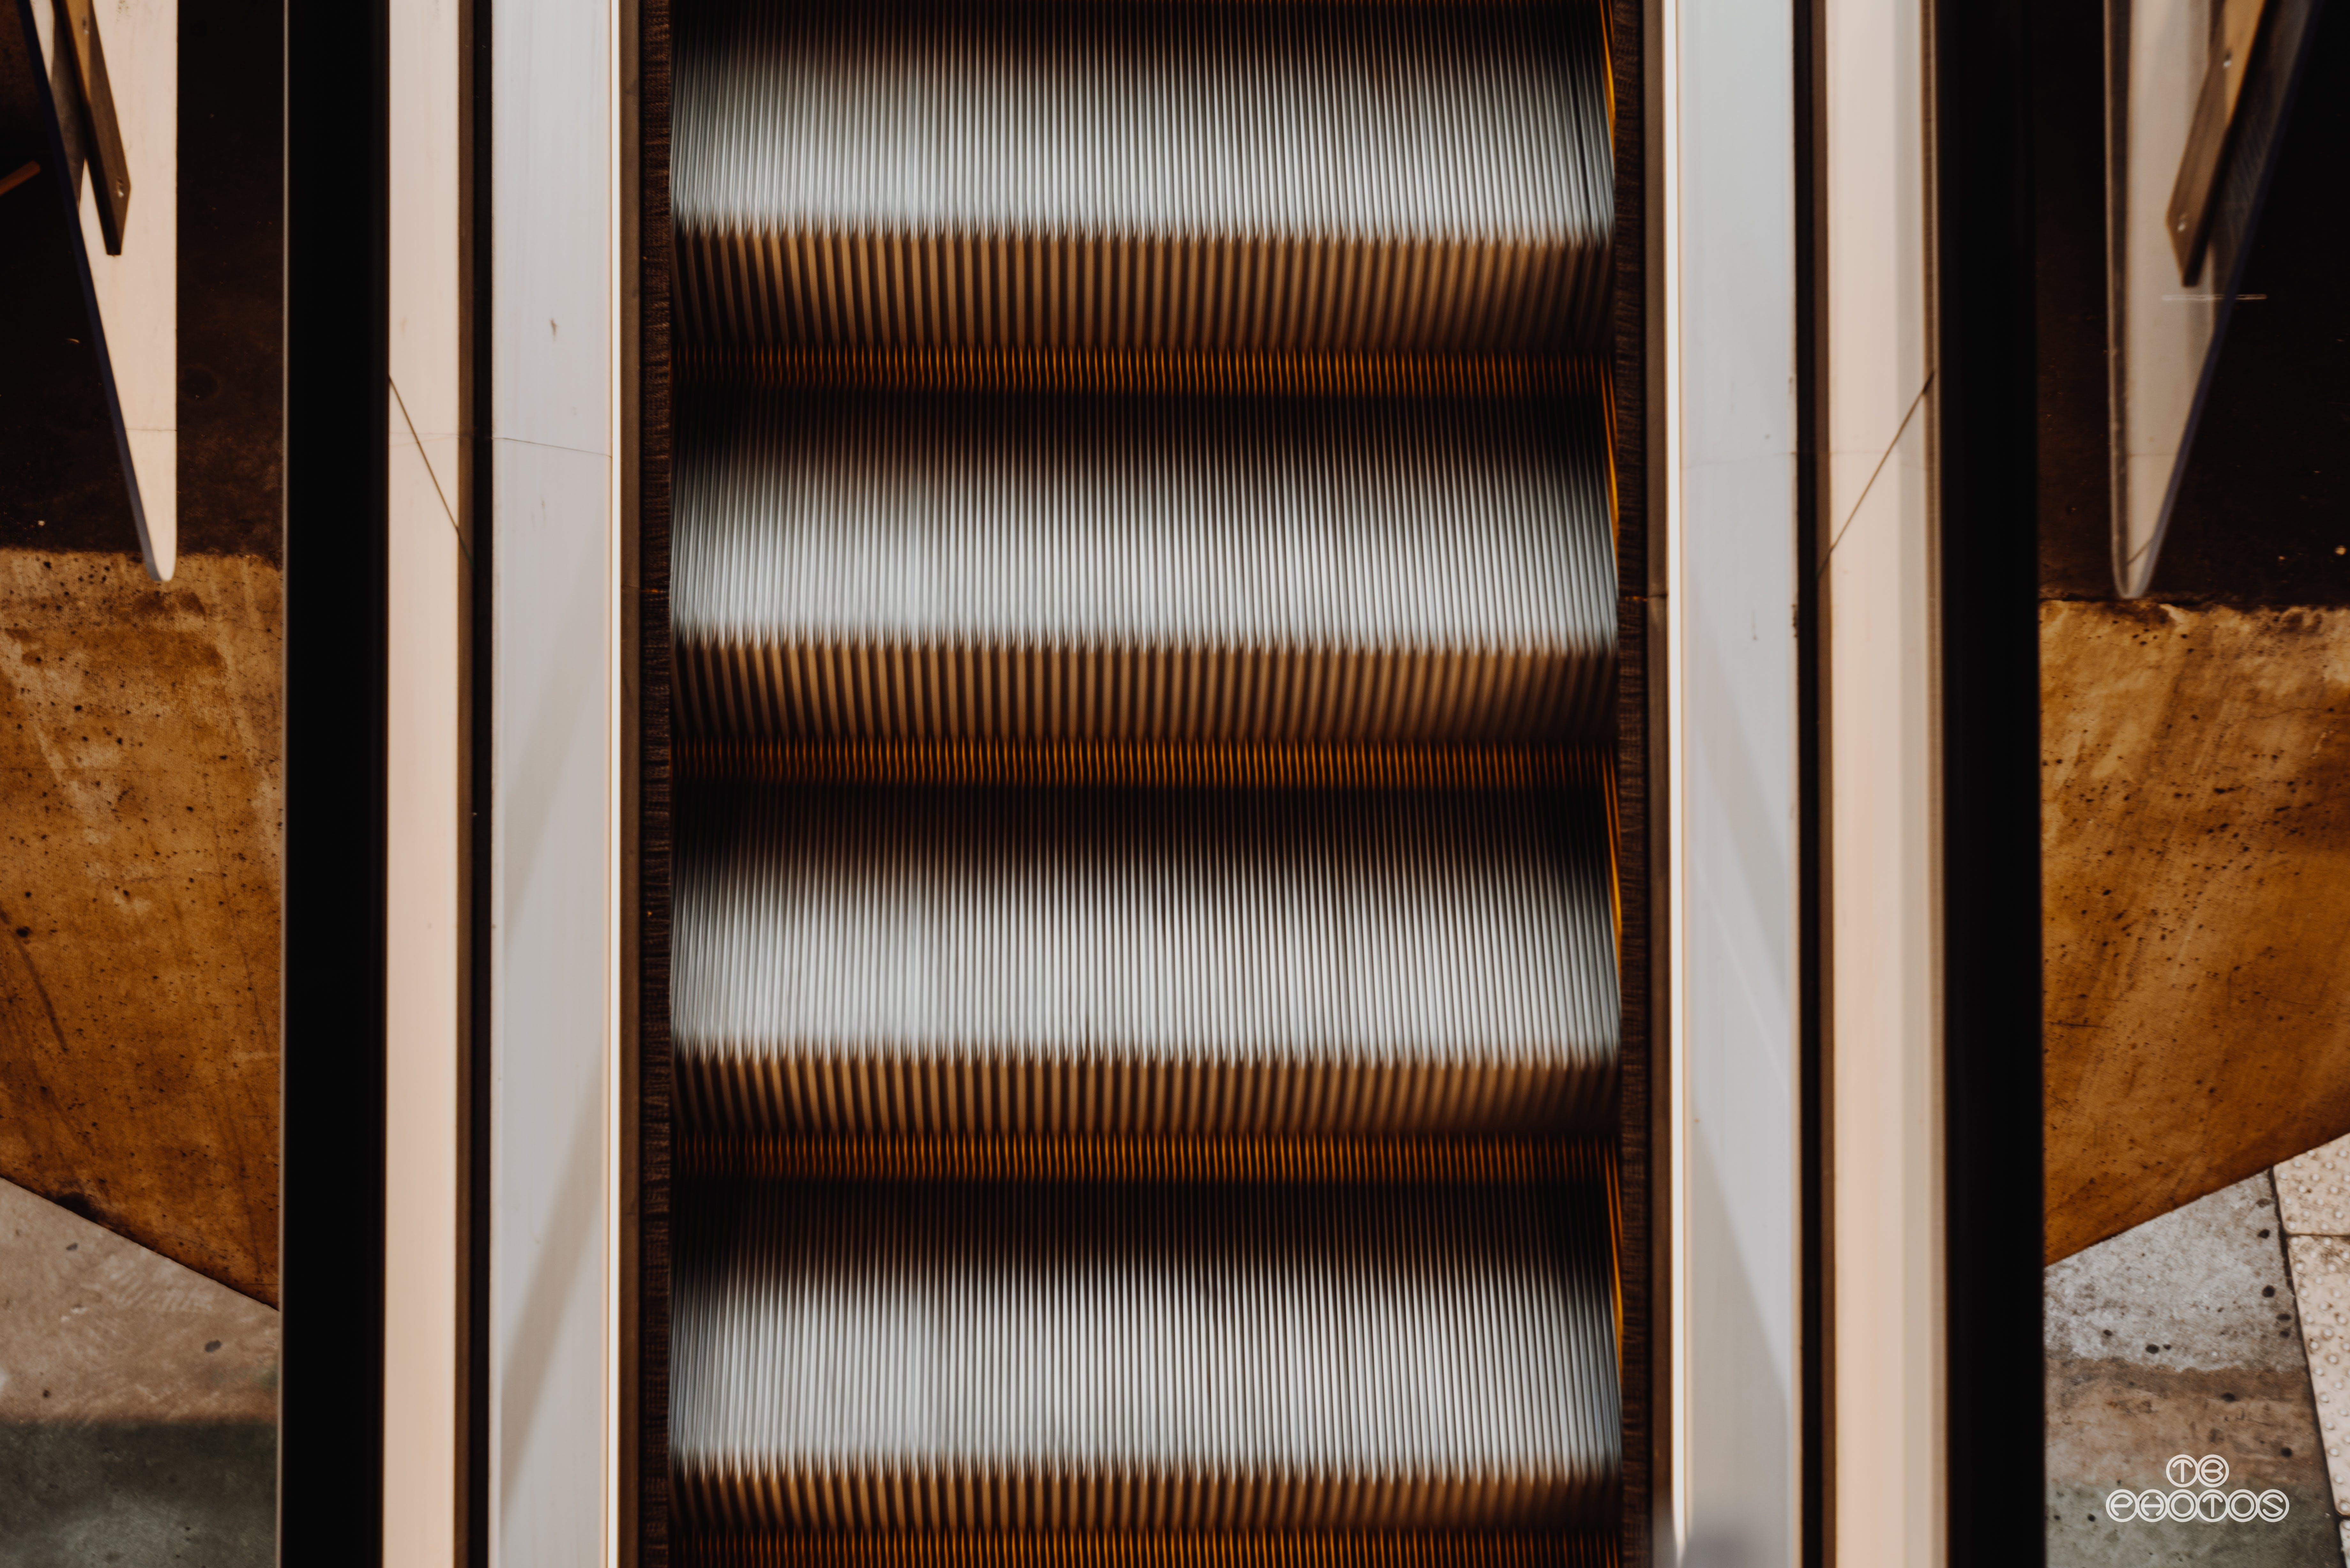 Free stock photo of escalator, stairs